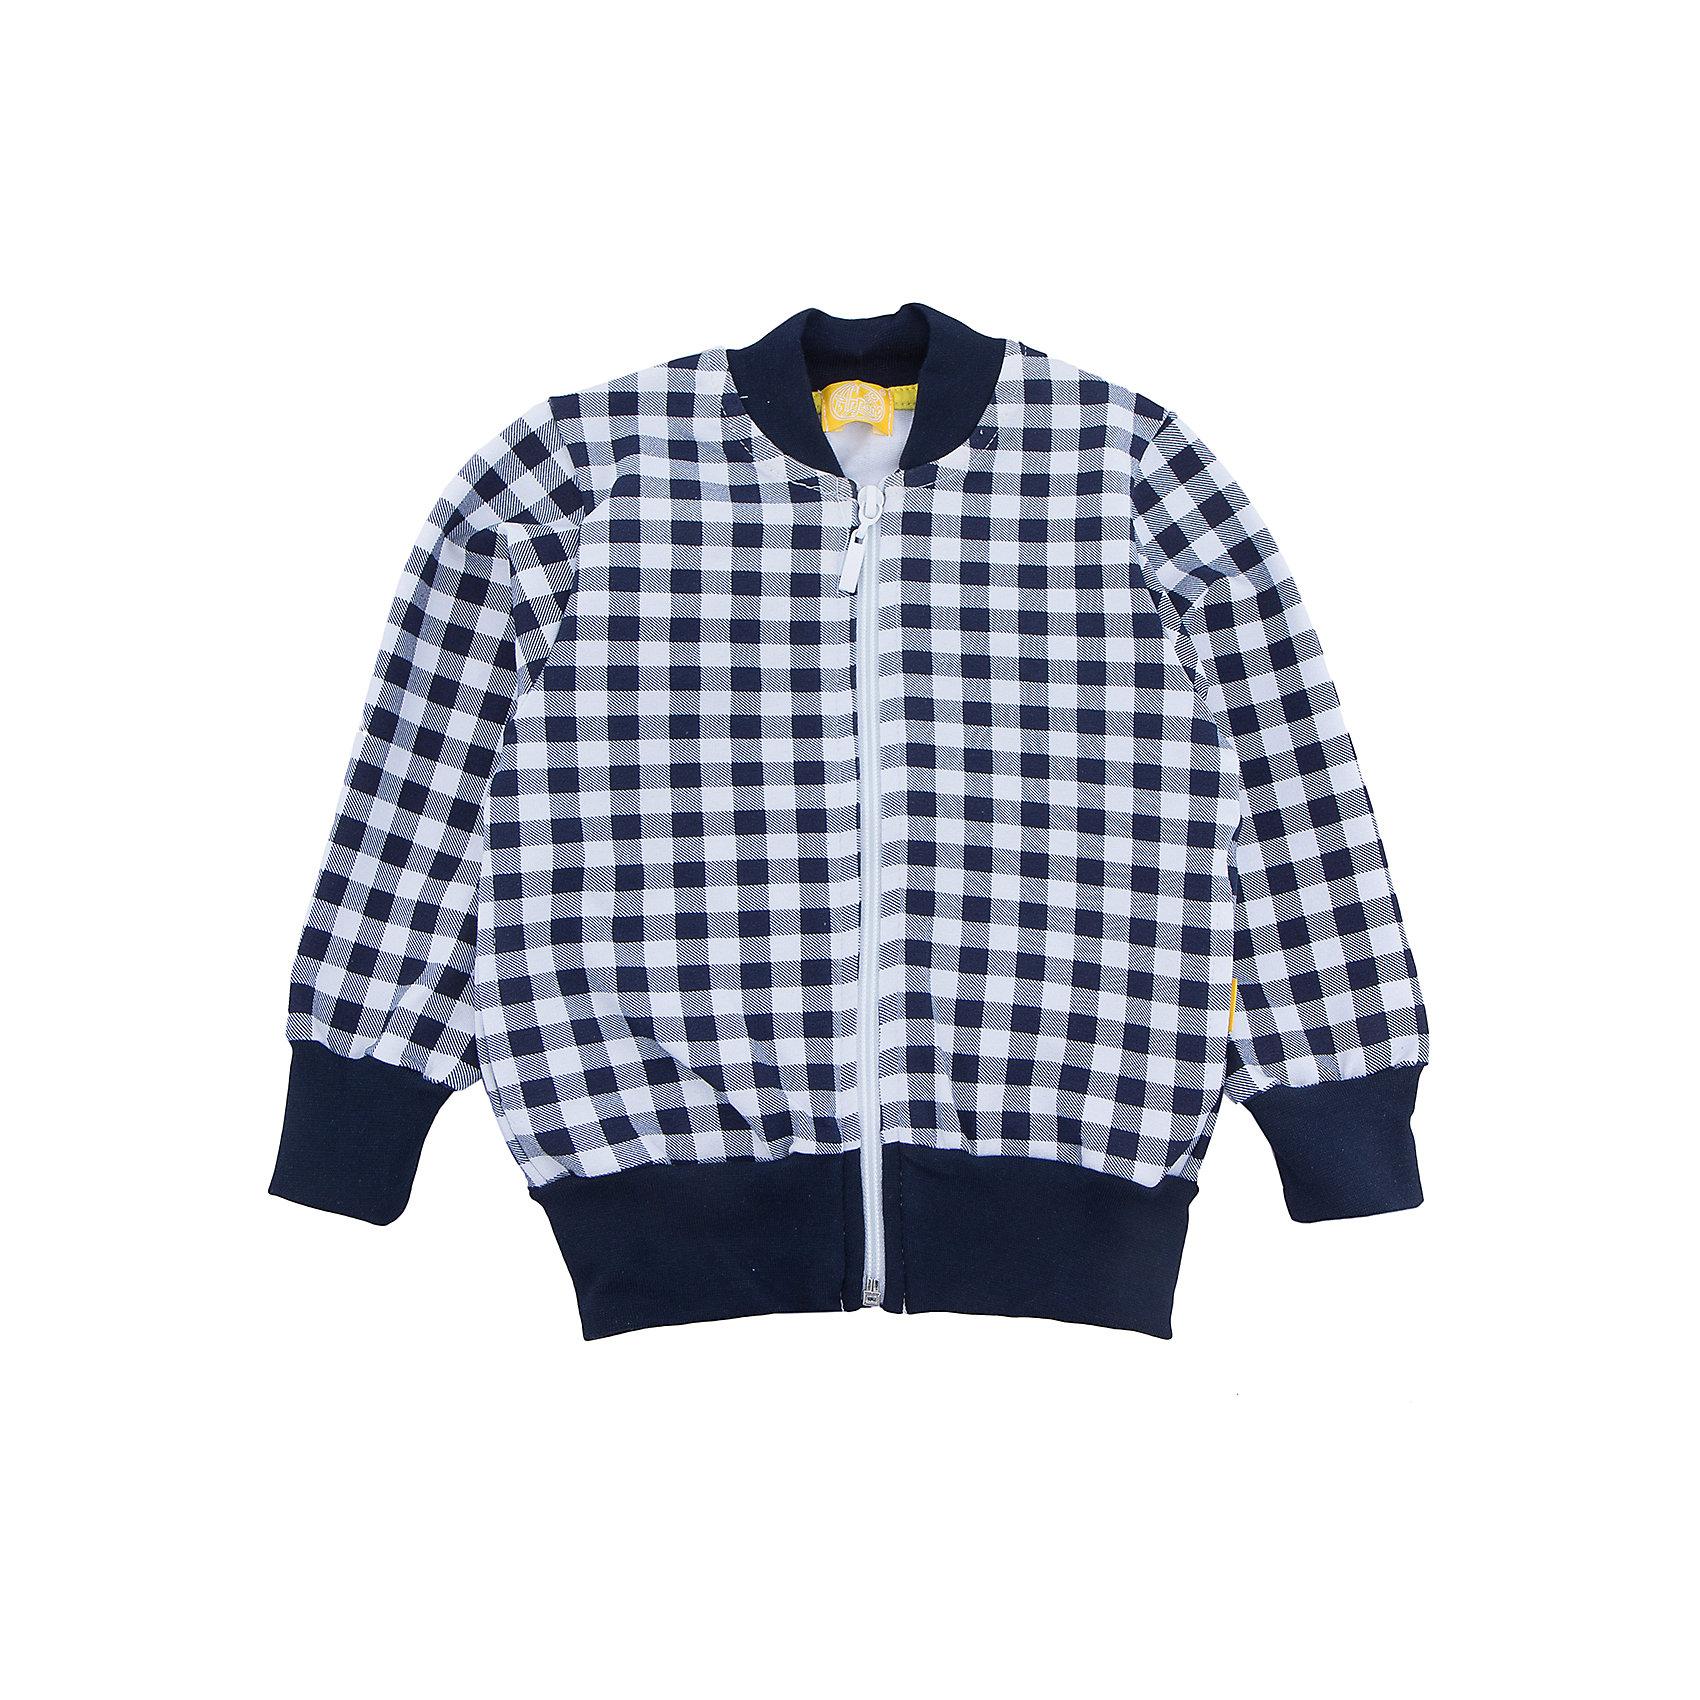 Куртка для мальчика АпрельВерхняя одежда<br>Куртка для мальчика Апрель.<br>Состав:<br>хлопок 95%, лайкра 5%<br><br>Ширина мм: 356<br>Глубина мм: 10<br>Высота мм: 245<br>Вес г: 519<br>Цвет: синий<br>Возраст от месяцев: 84<br>Возраст до месяцев: 96<br>Пол: Мужской<br>Возраст: Детский<br>Размер: 92,98,104,110,116,122,128<br>SKU: 5515829